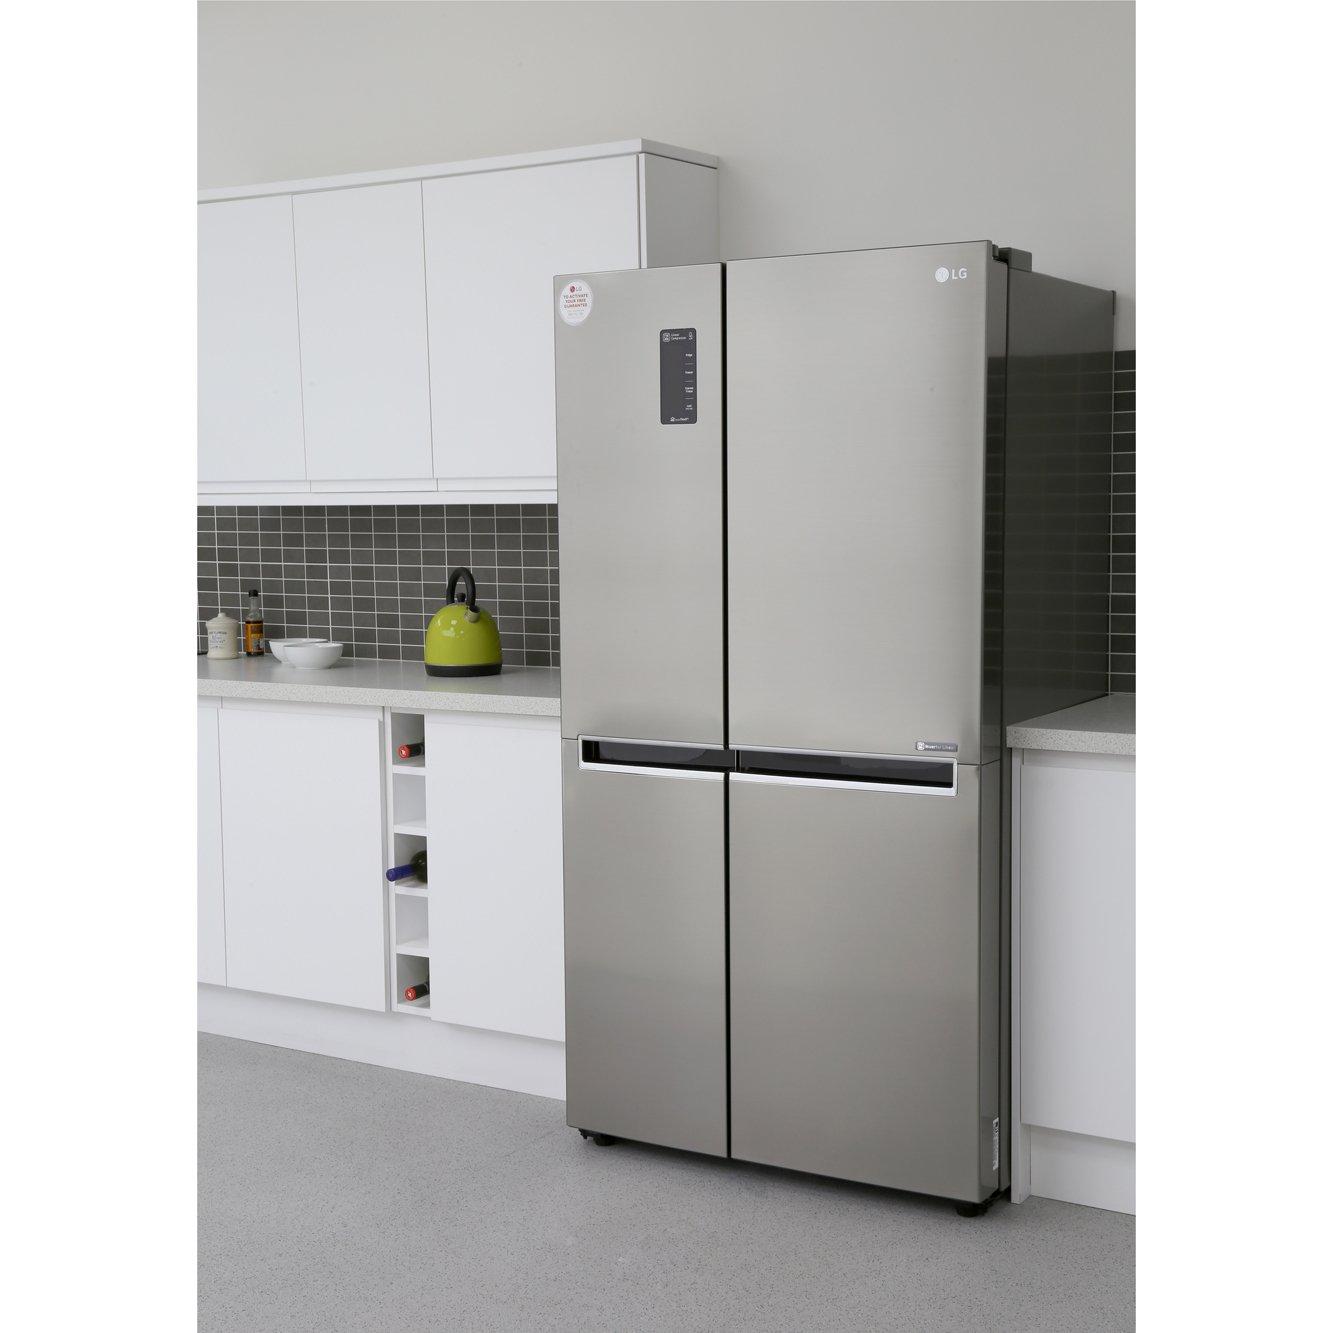 Buy Lg Gsb760pzxv American Fridge Freezer Stainless